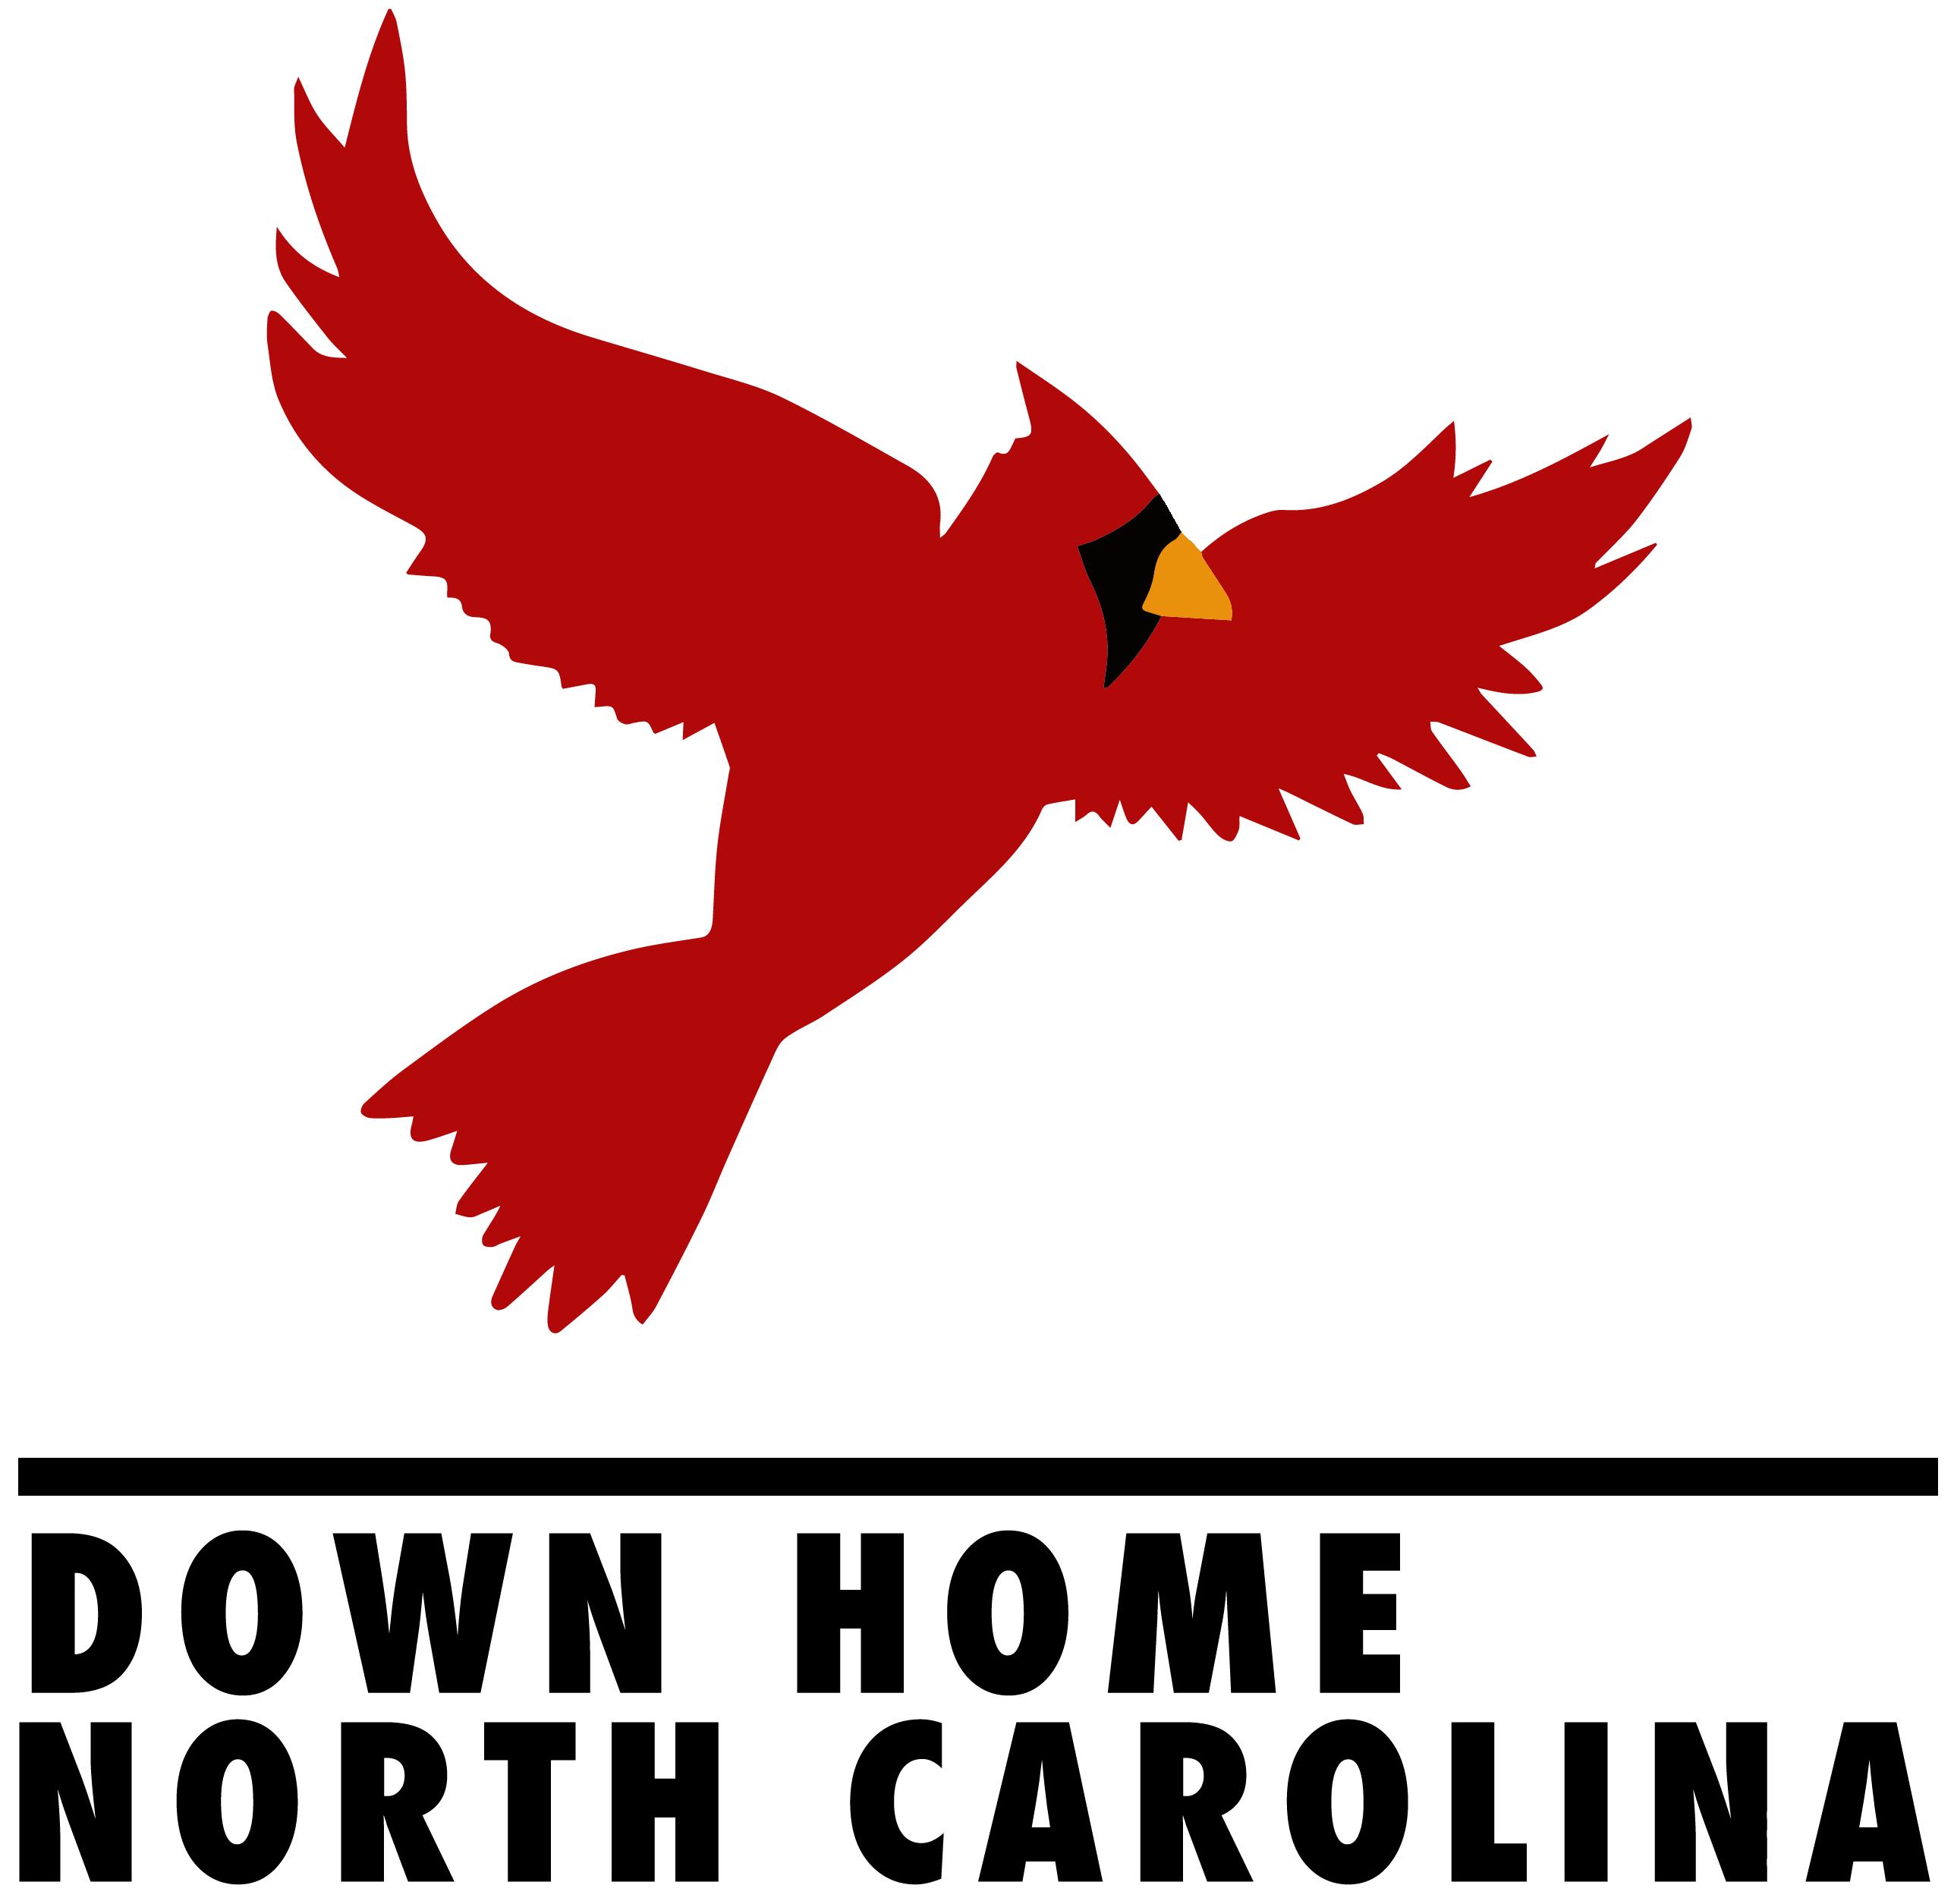 Down Home North Carolina